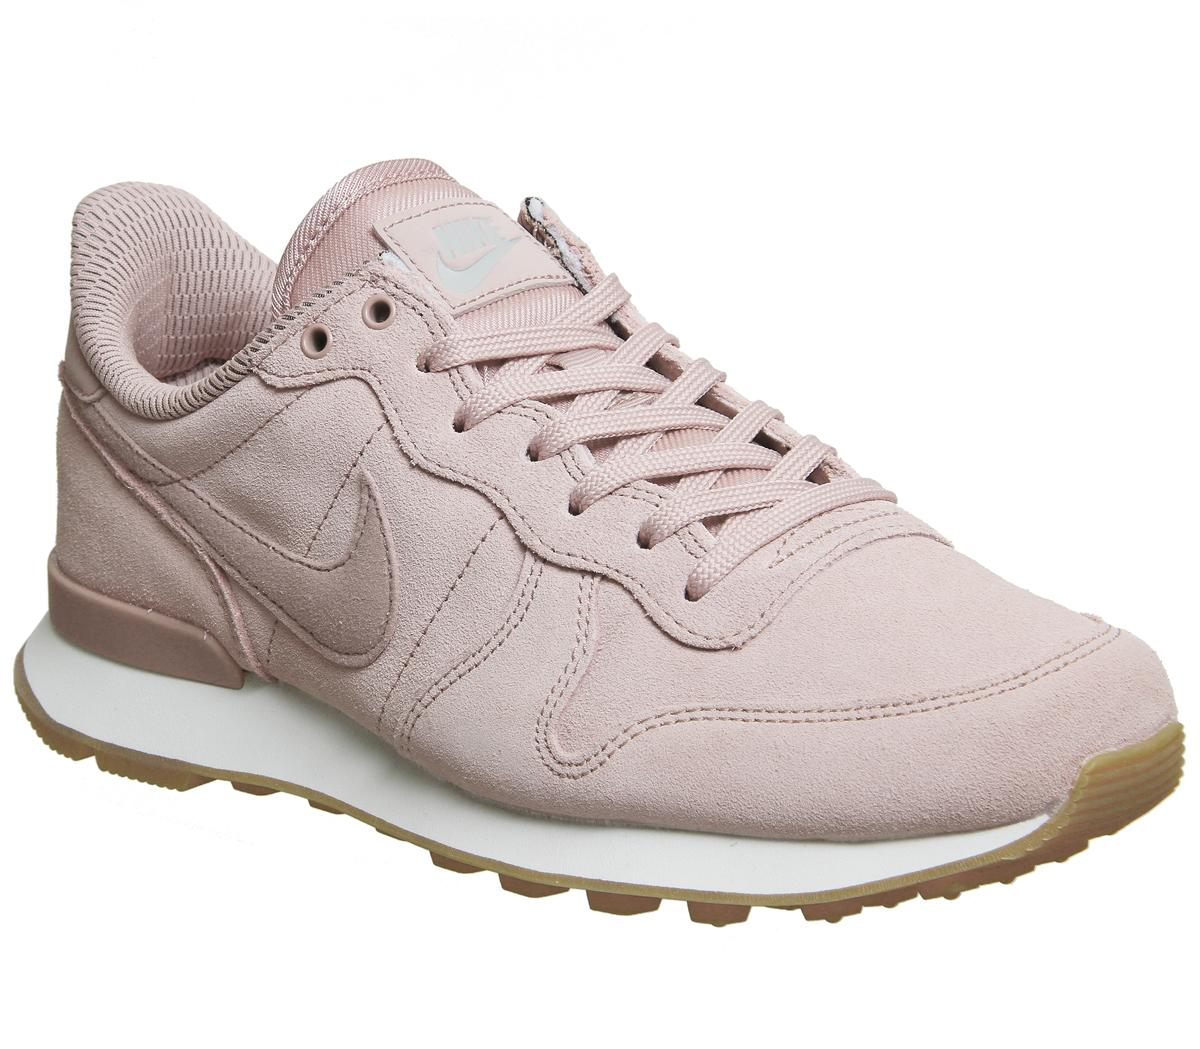 Nike Nike Internationalist Trainers Particle Pink - Sneaker damen